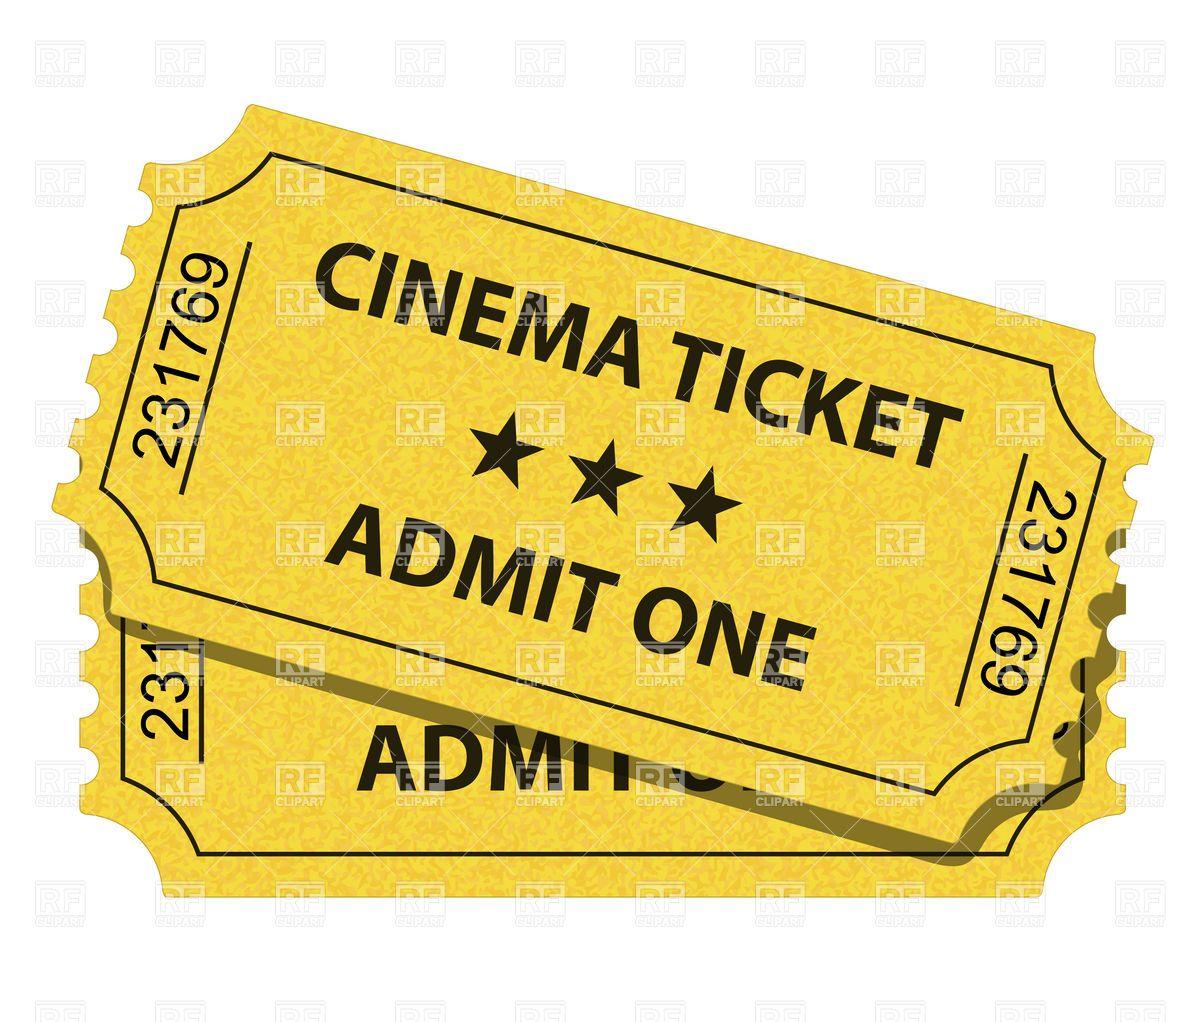 Movie Tickets Png Free Movie Tickets Png Transparent Images 15382 Pngio Cinema Ticket Movie Tickets Cinema